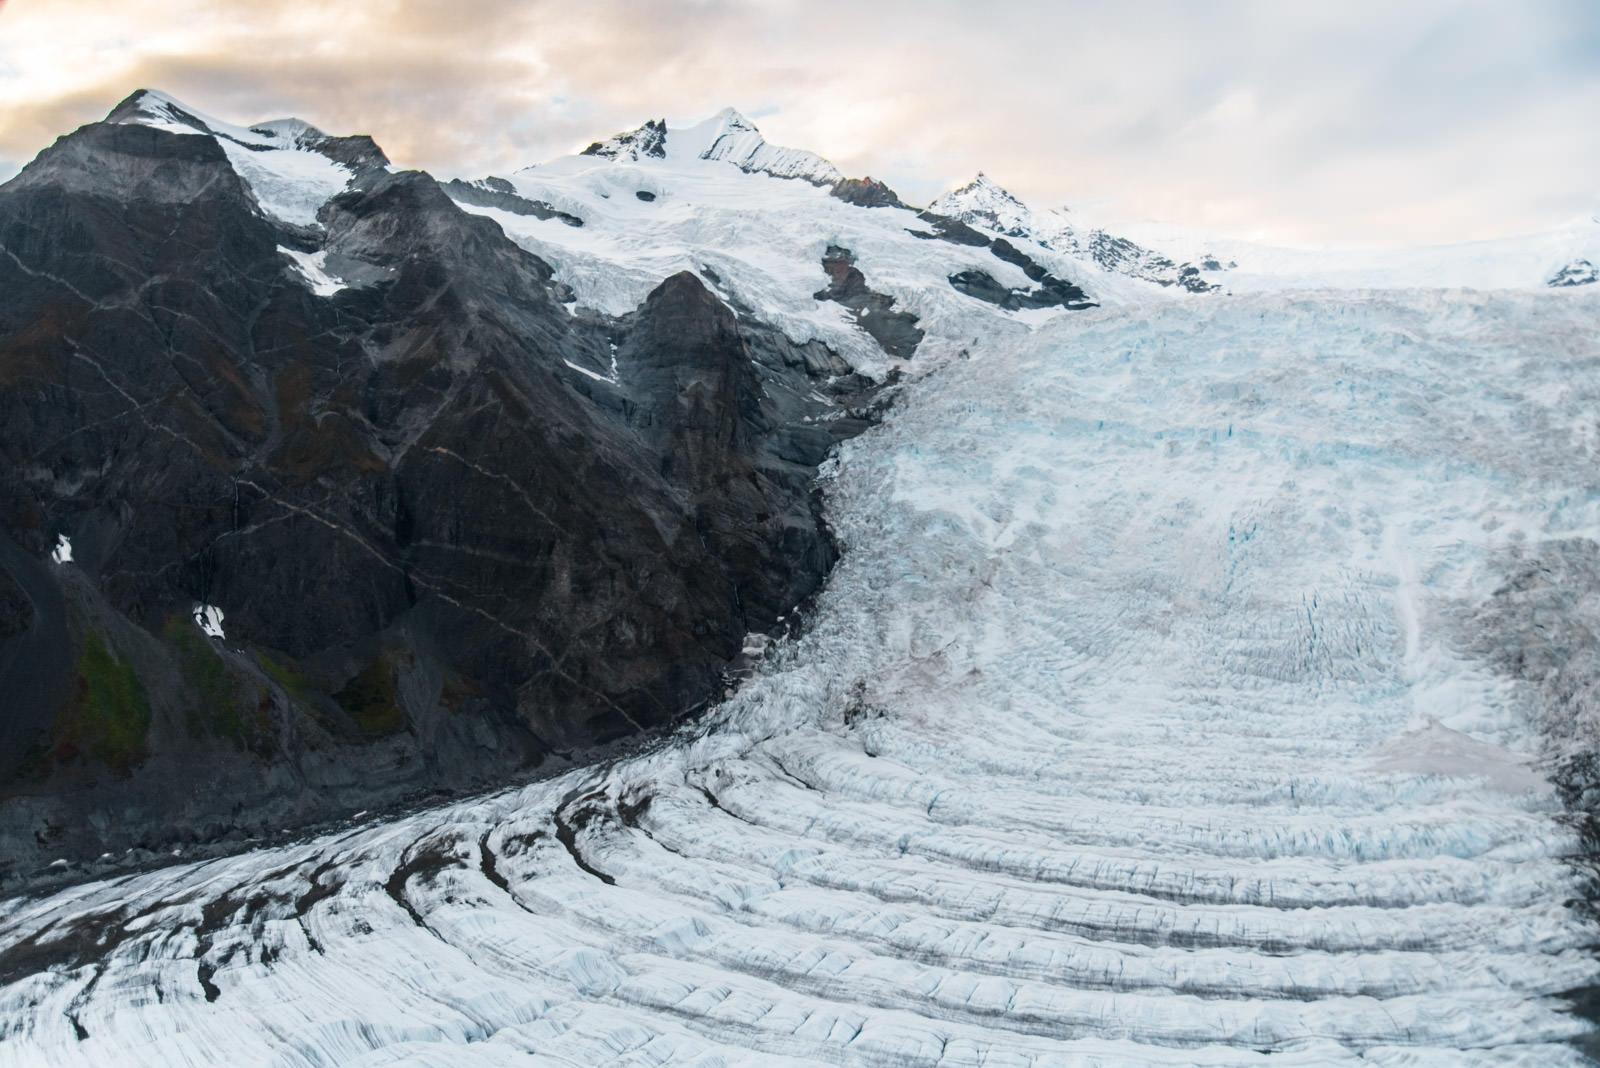 Mile High Cliff Tour: Kennicott Valley, Gates Glacier Ogives